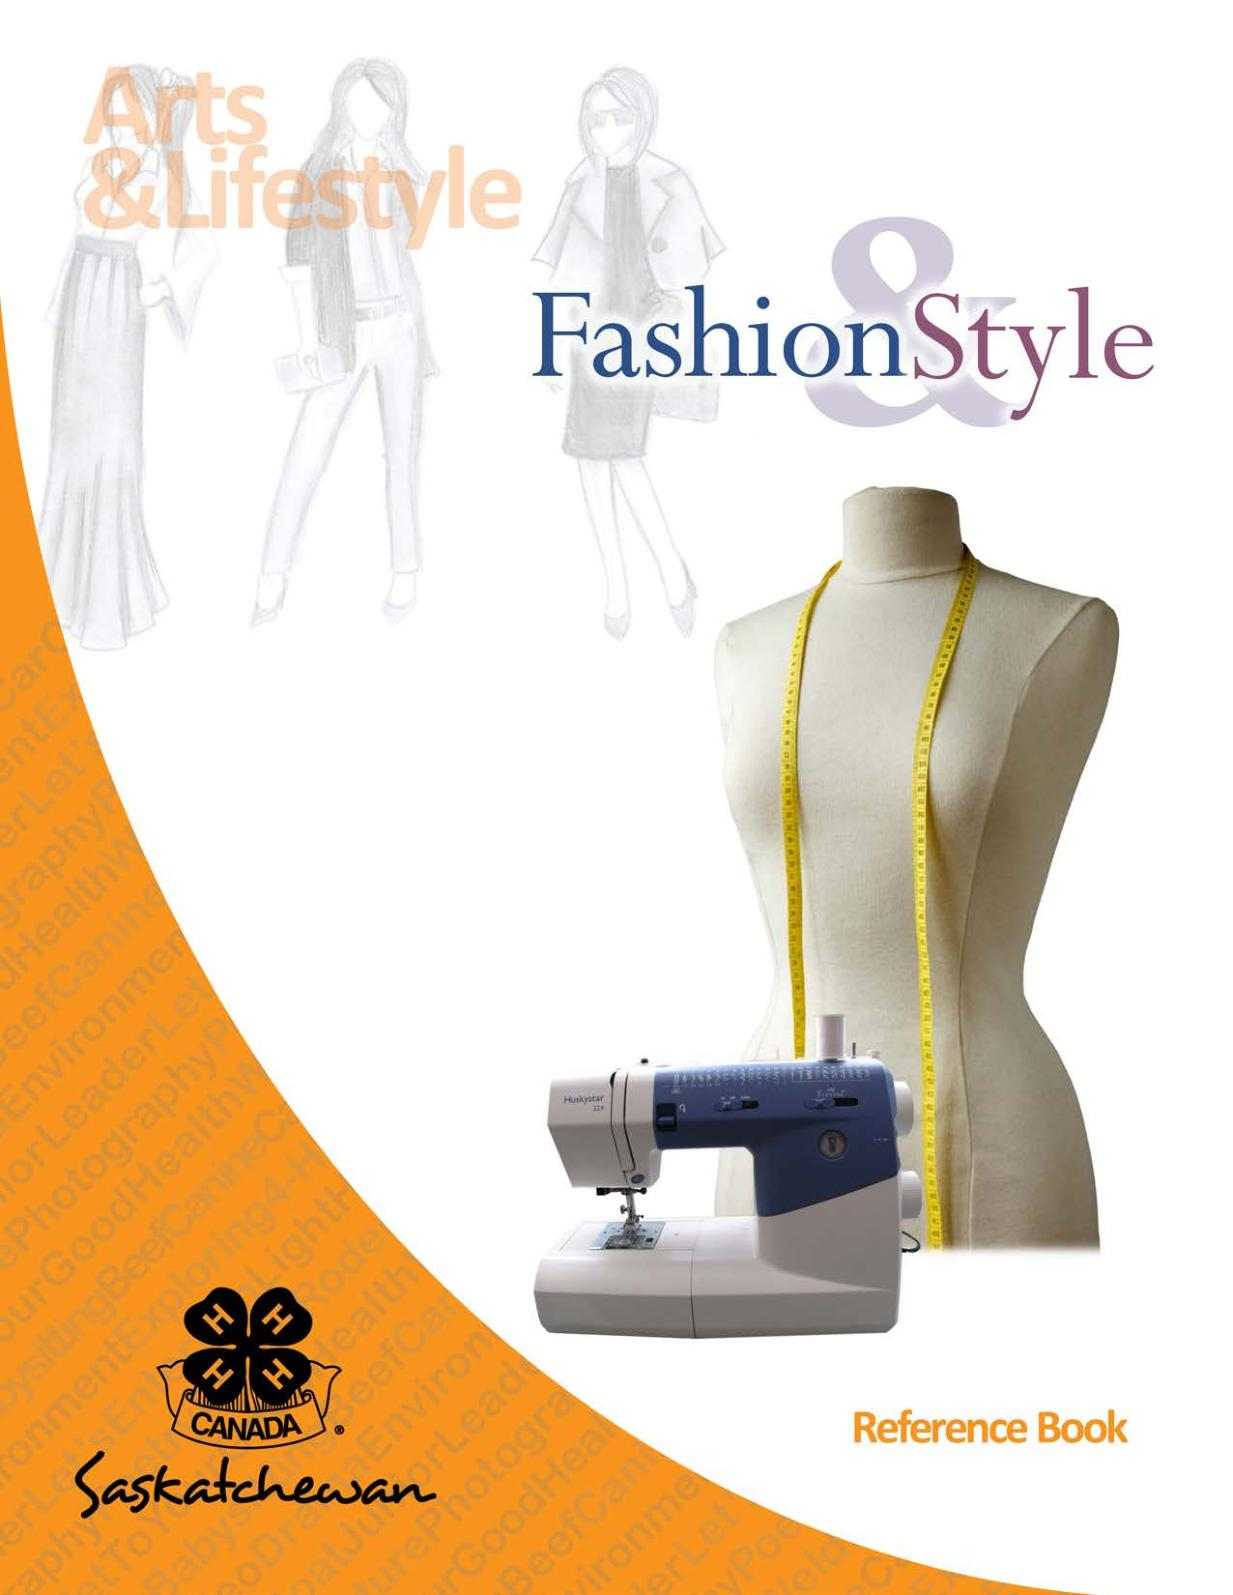 Pattern Fashion Design Kit Seam Ripper Tracing Wheel Armhole Single Curve Maker